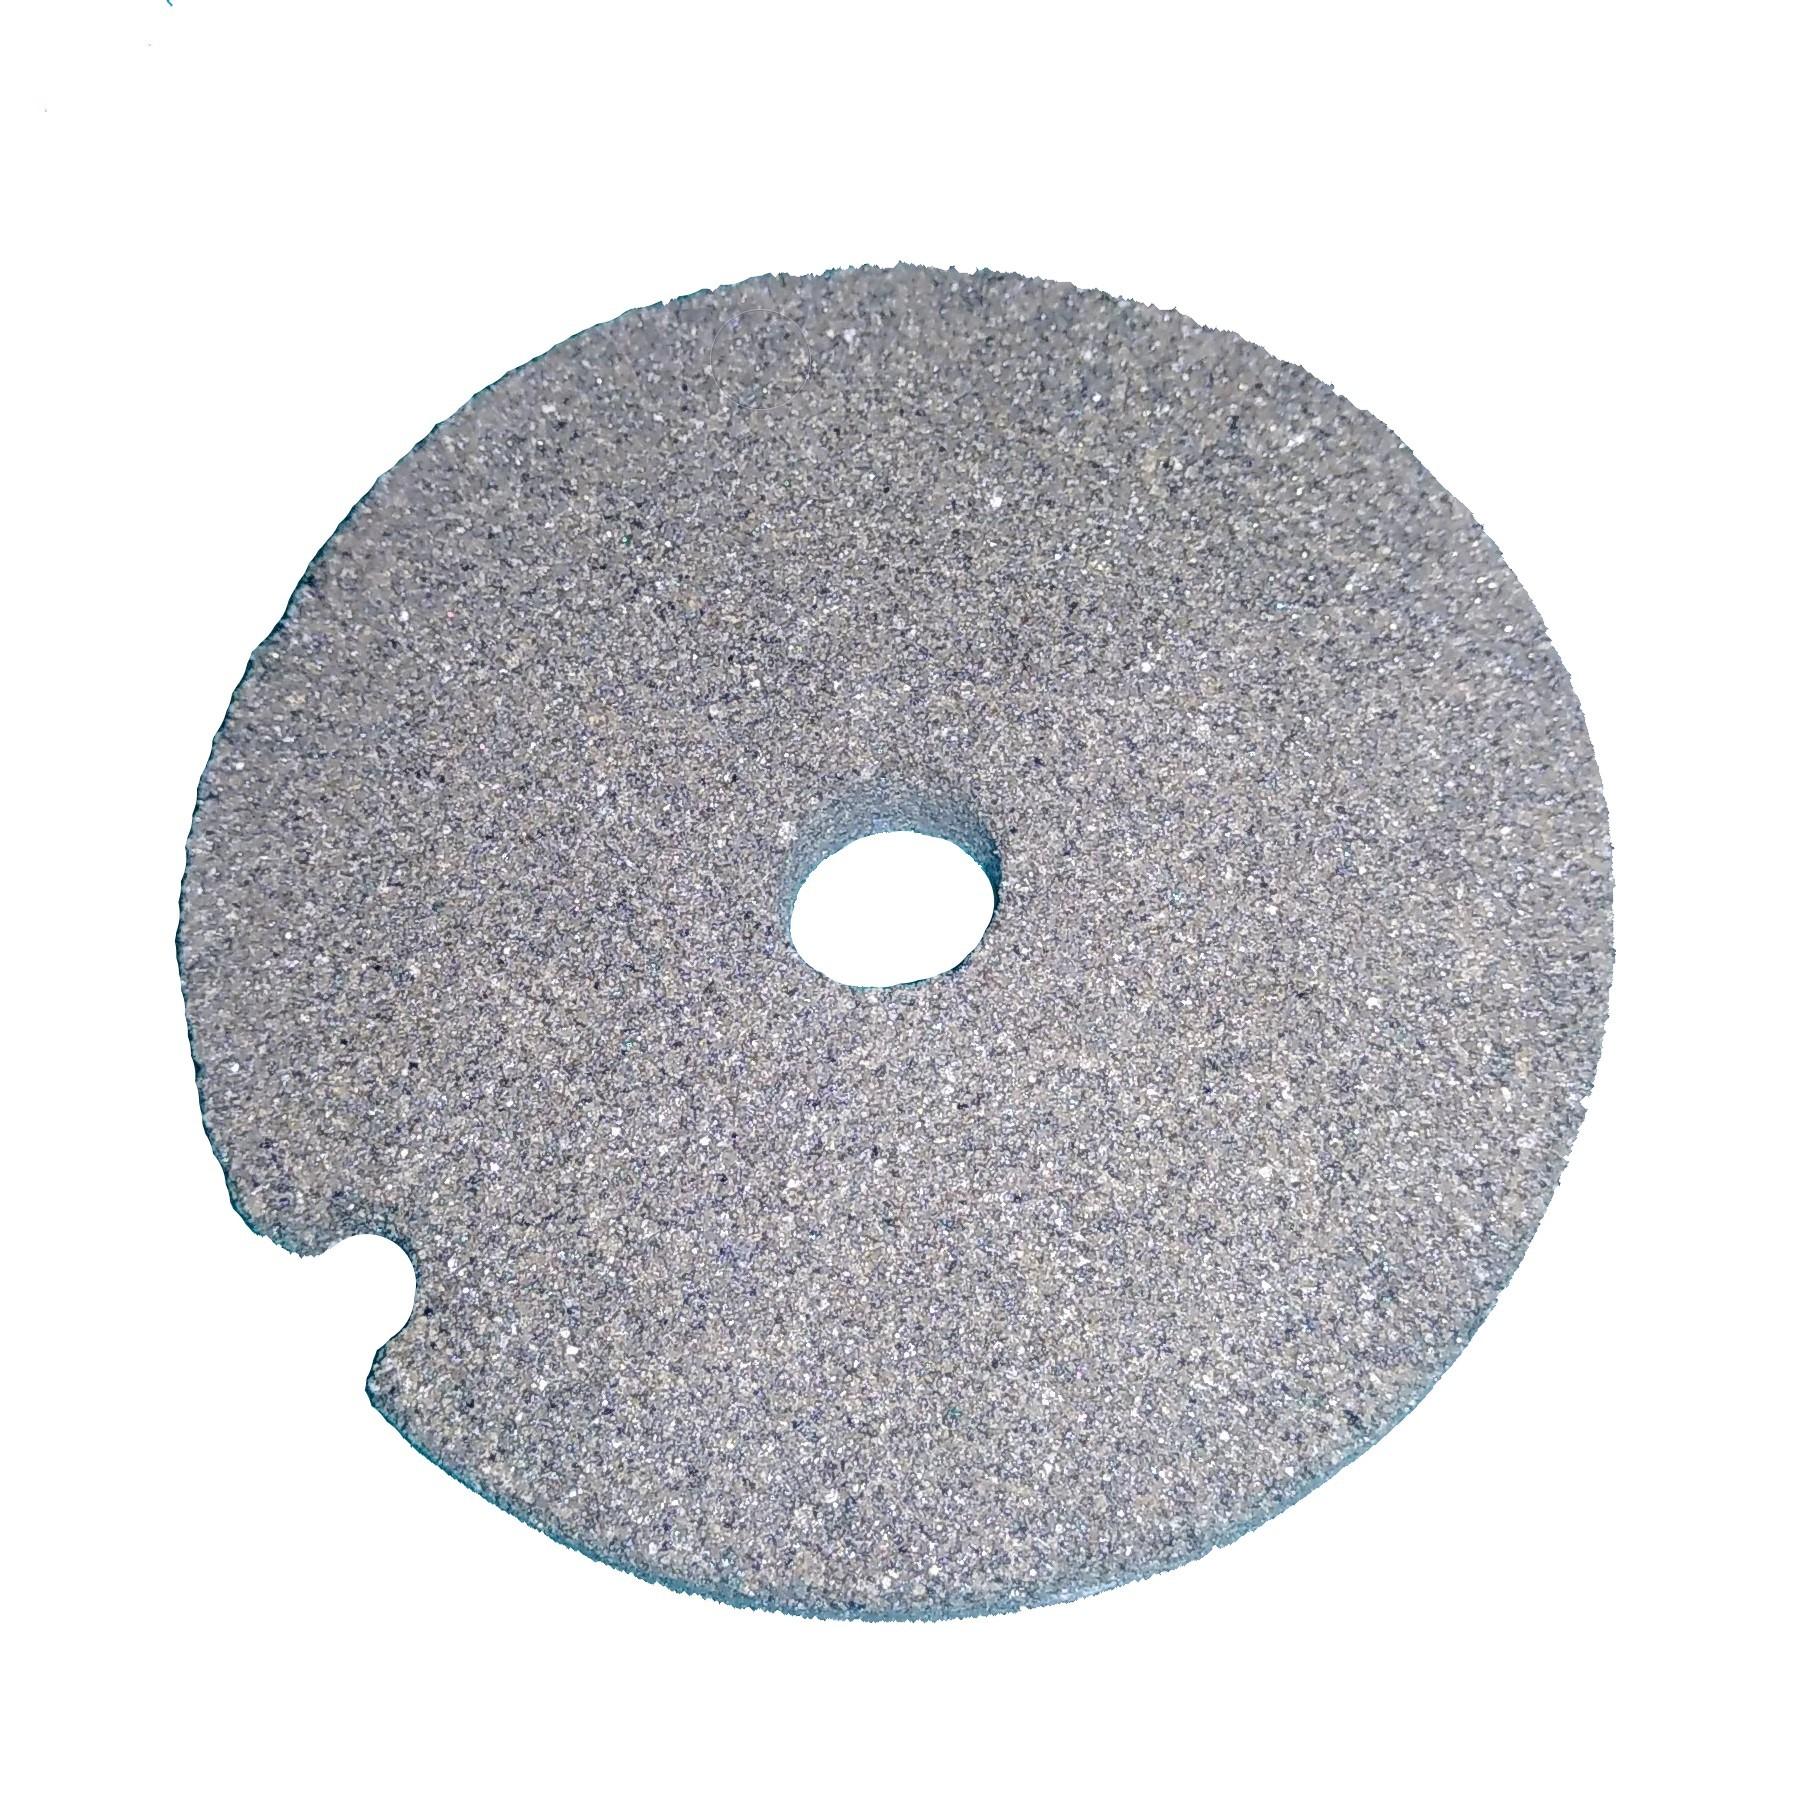 Камень для заточки ножа мясорубки